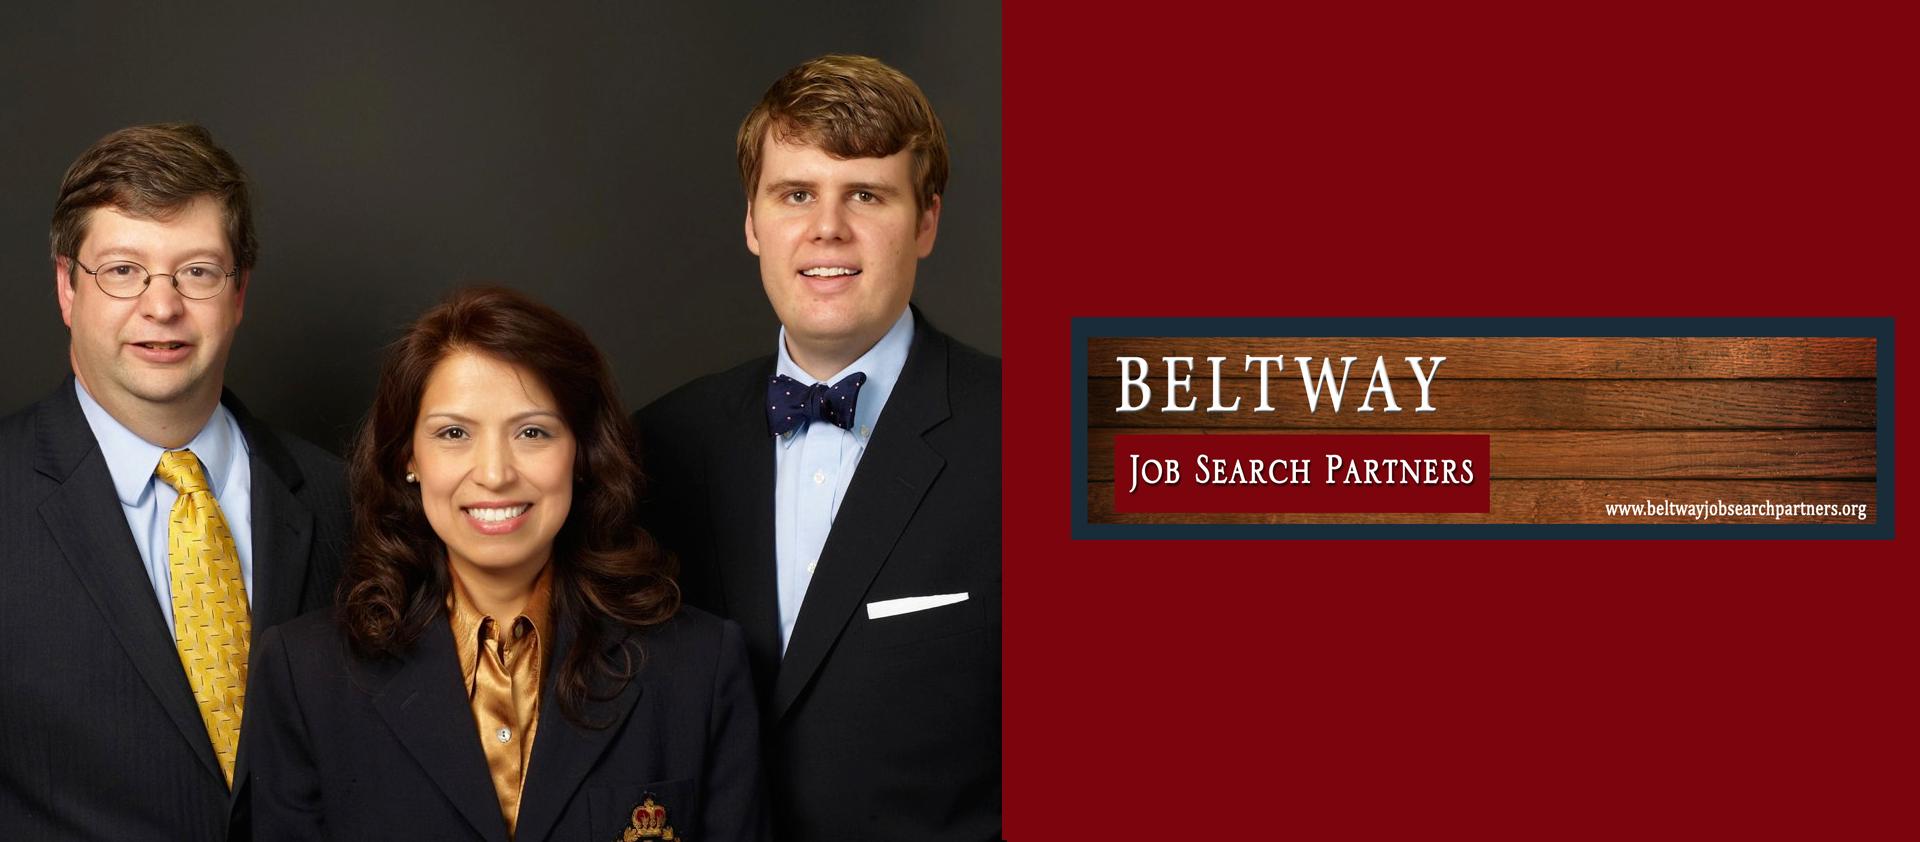 Beltway Job Search Partners